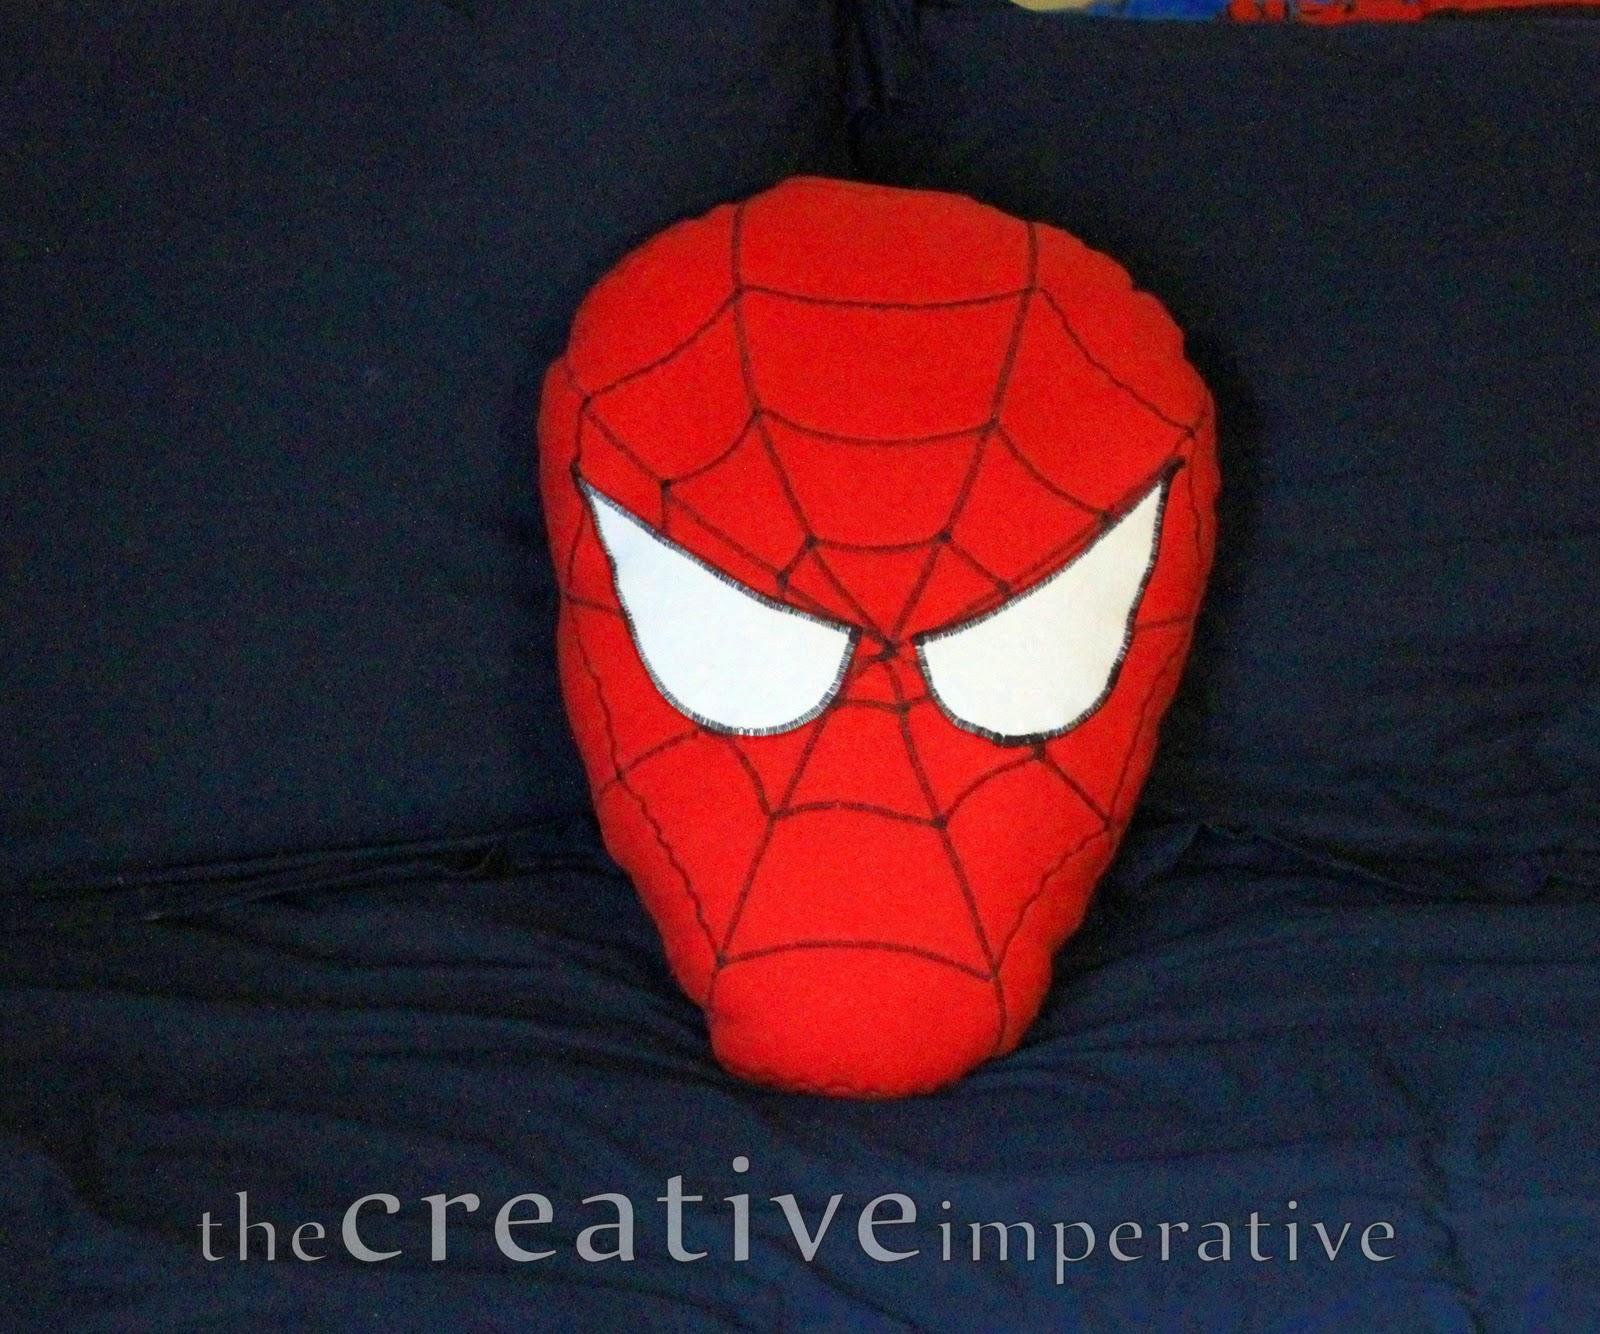 The Creative Imperative Spiderman Pillow Tutorial